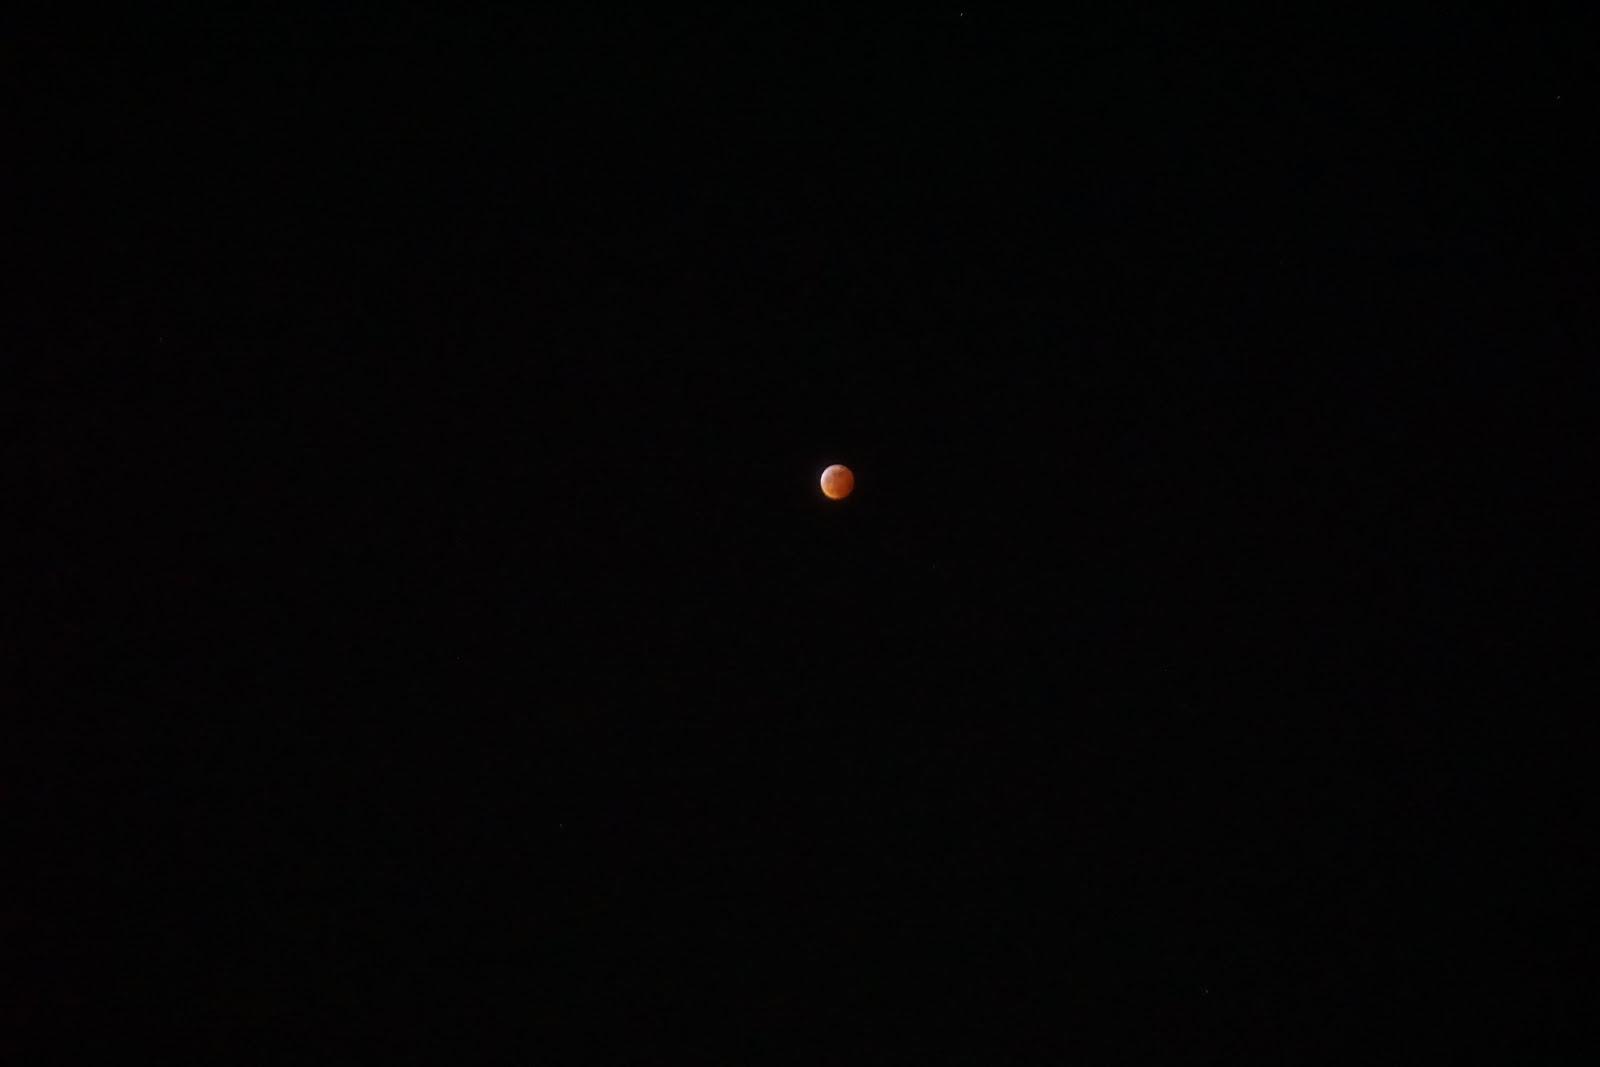 blood moon july 2018 calgary - photo #16